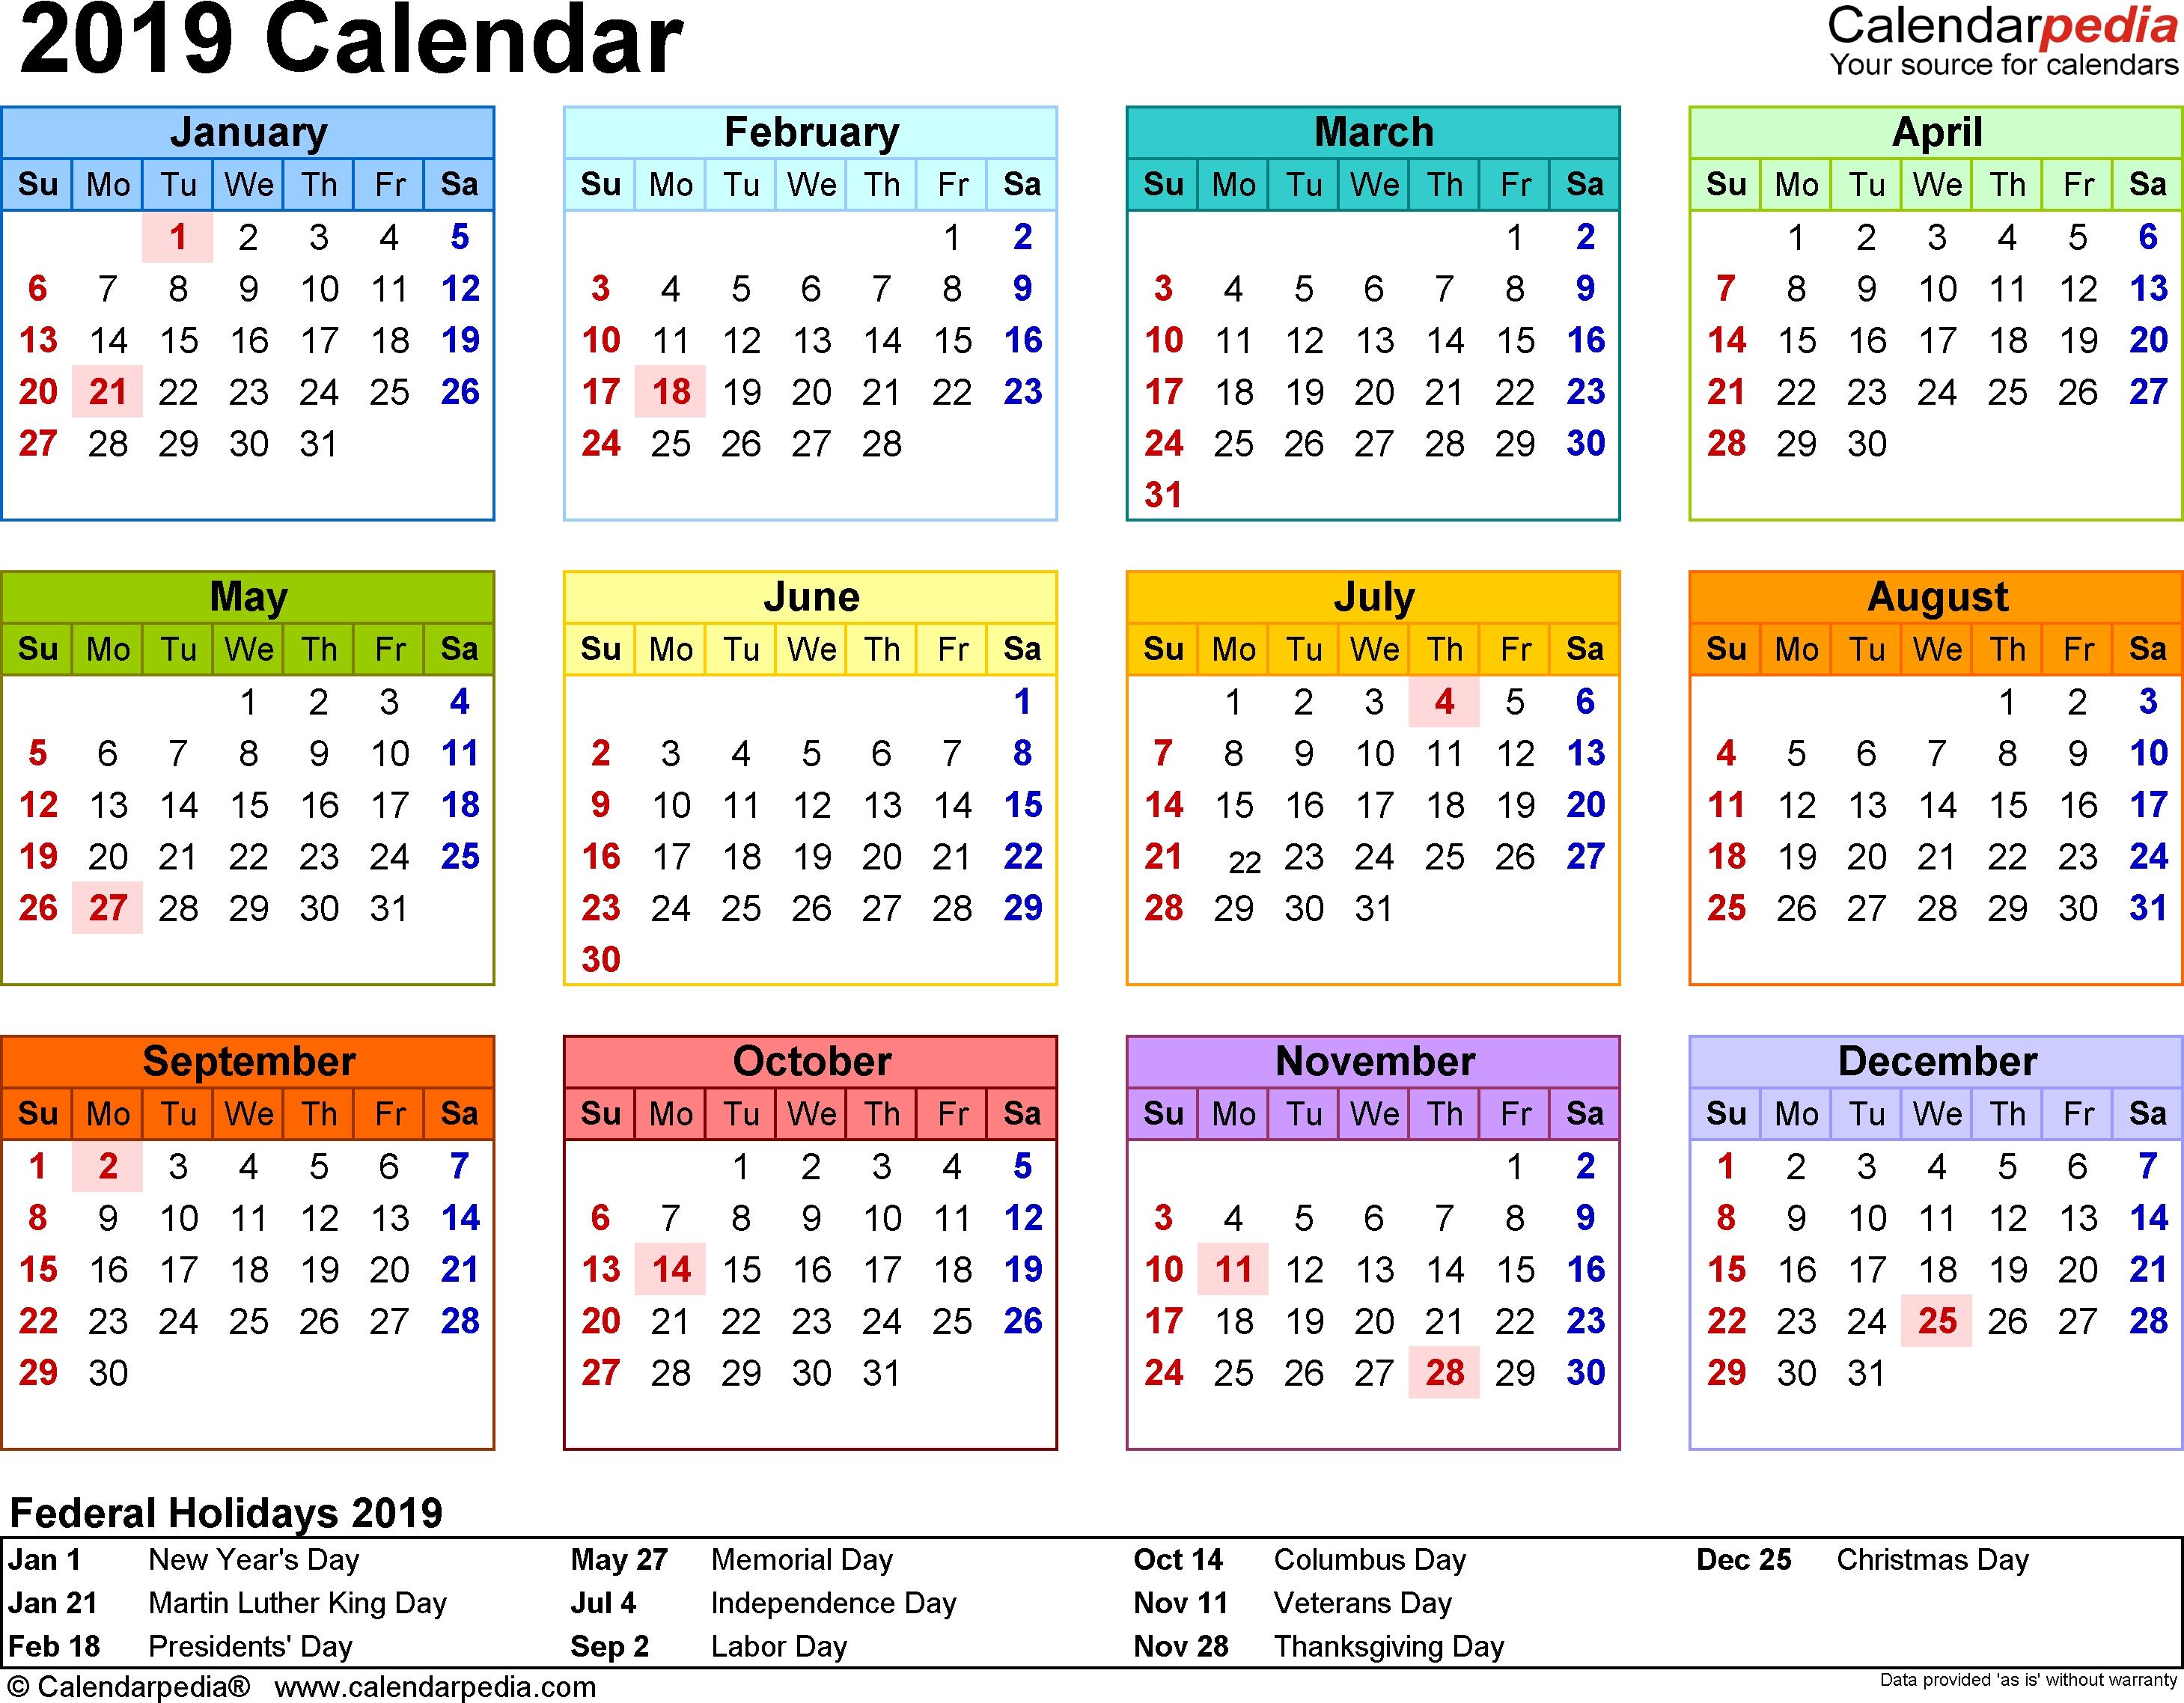 2019 Calendar - 17 Free Printable Word Calendar Templates throughout Free Printable Calendar Templates 8 X 10